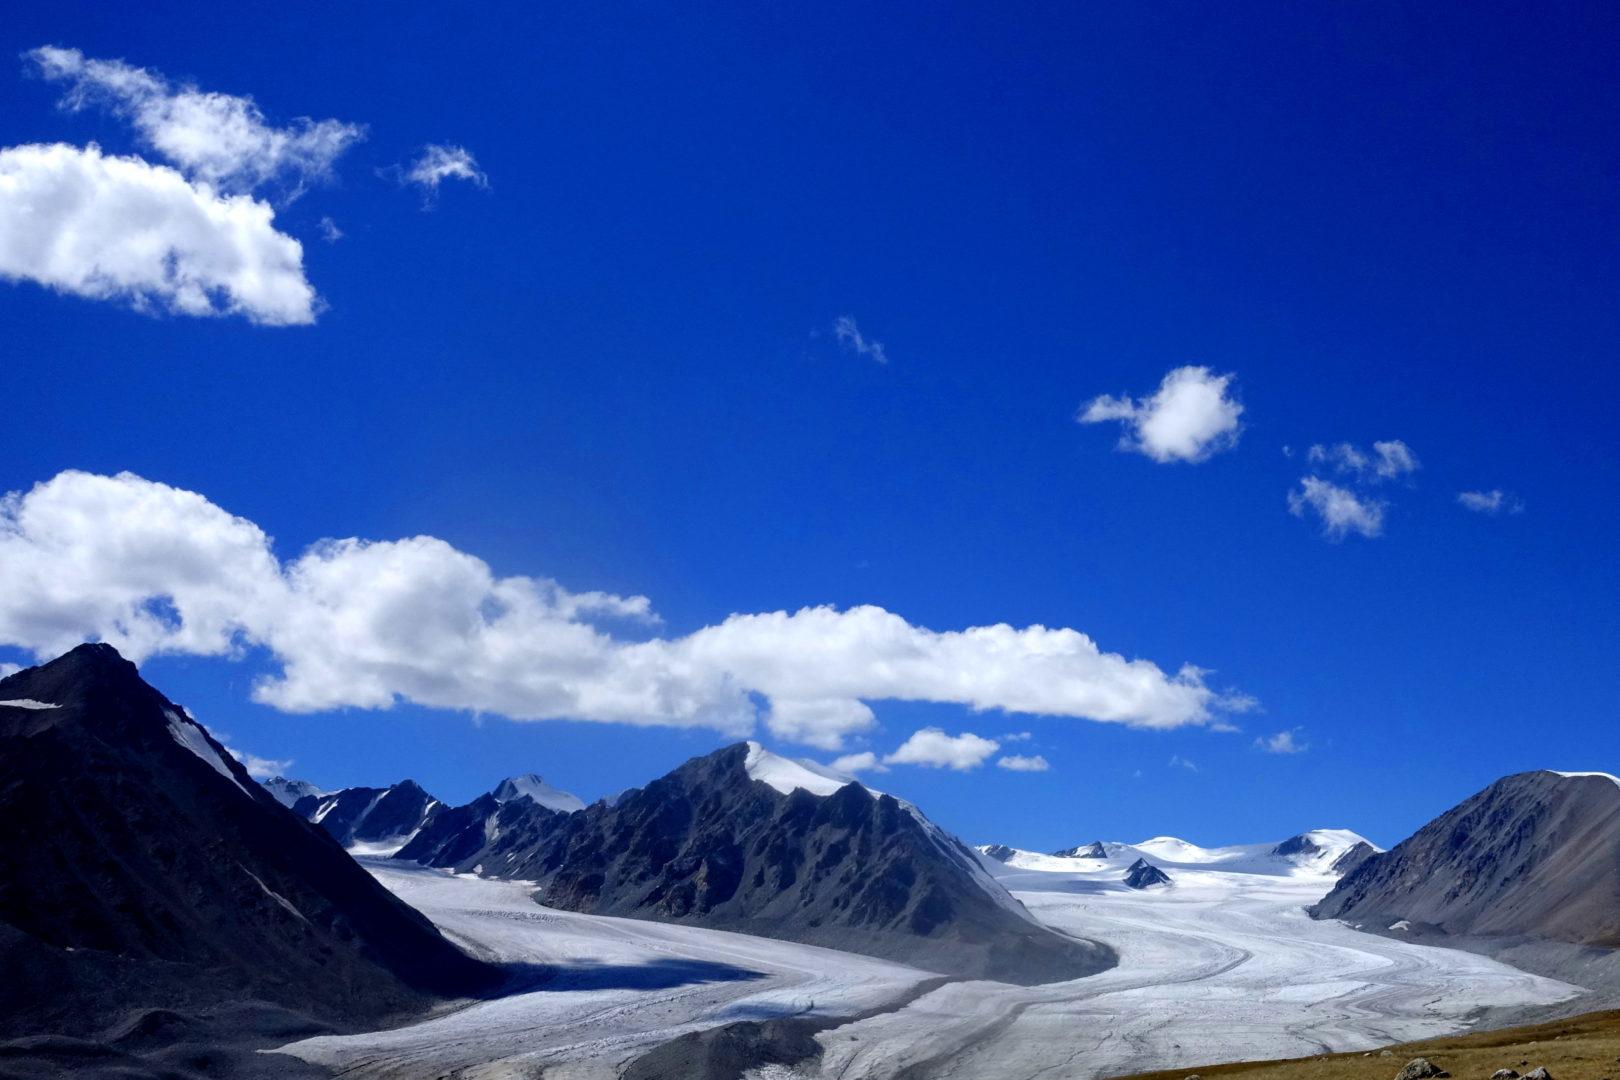 Mongolei-Reise: Fünf-Königs-Massiv am Altai-Gebirge